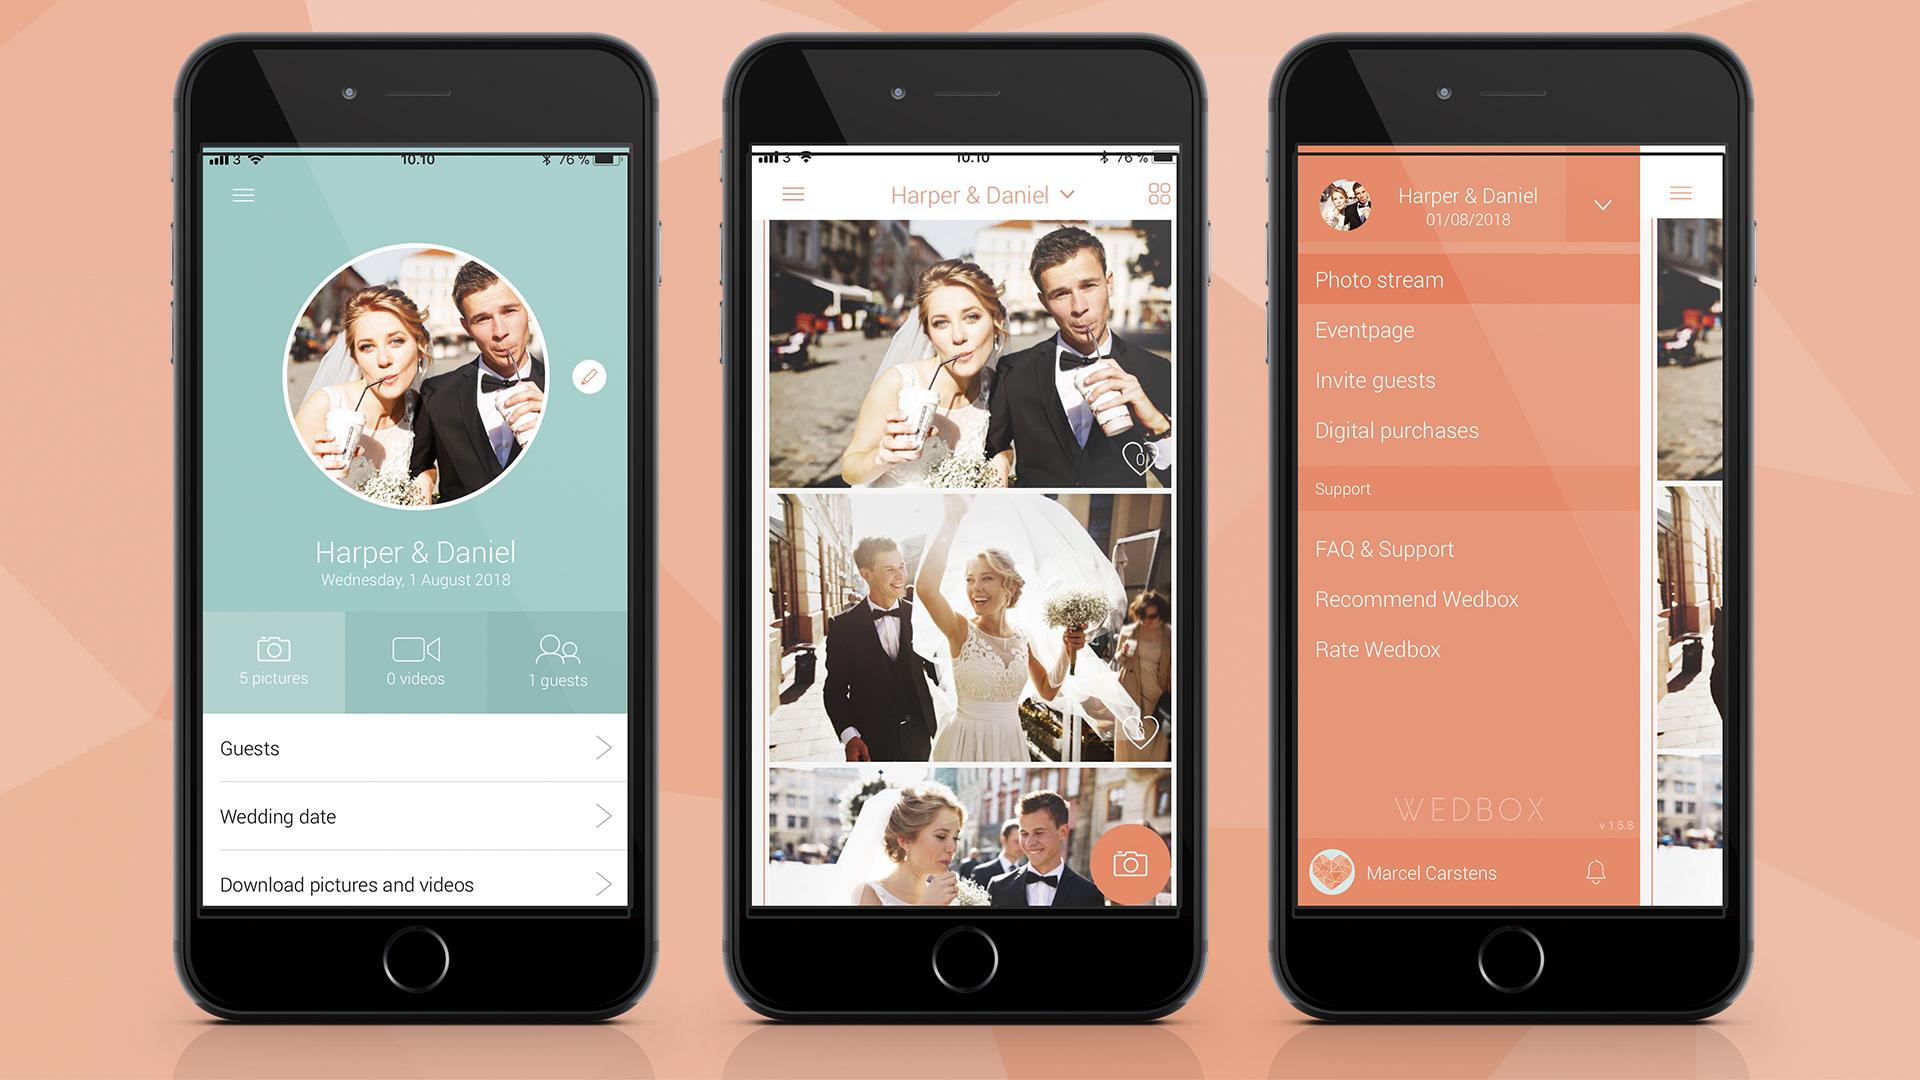 Wedbox app